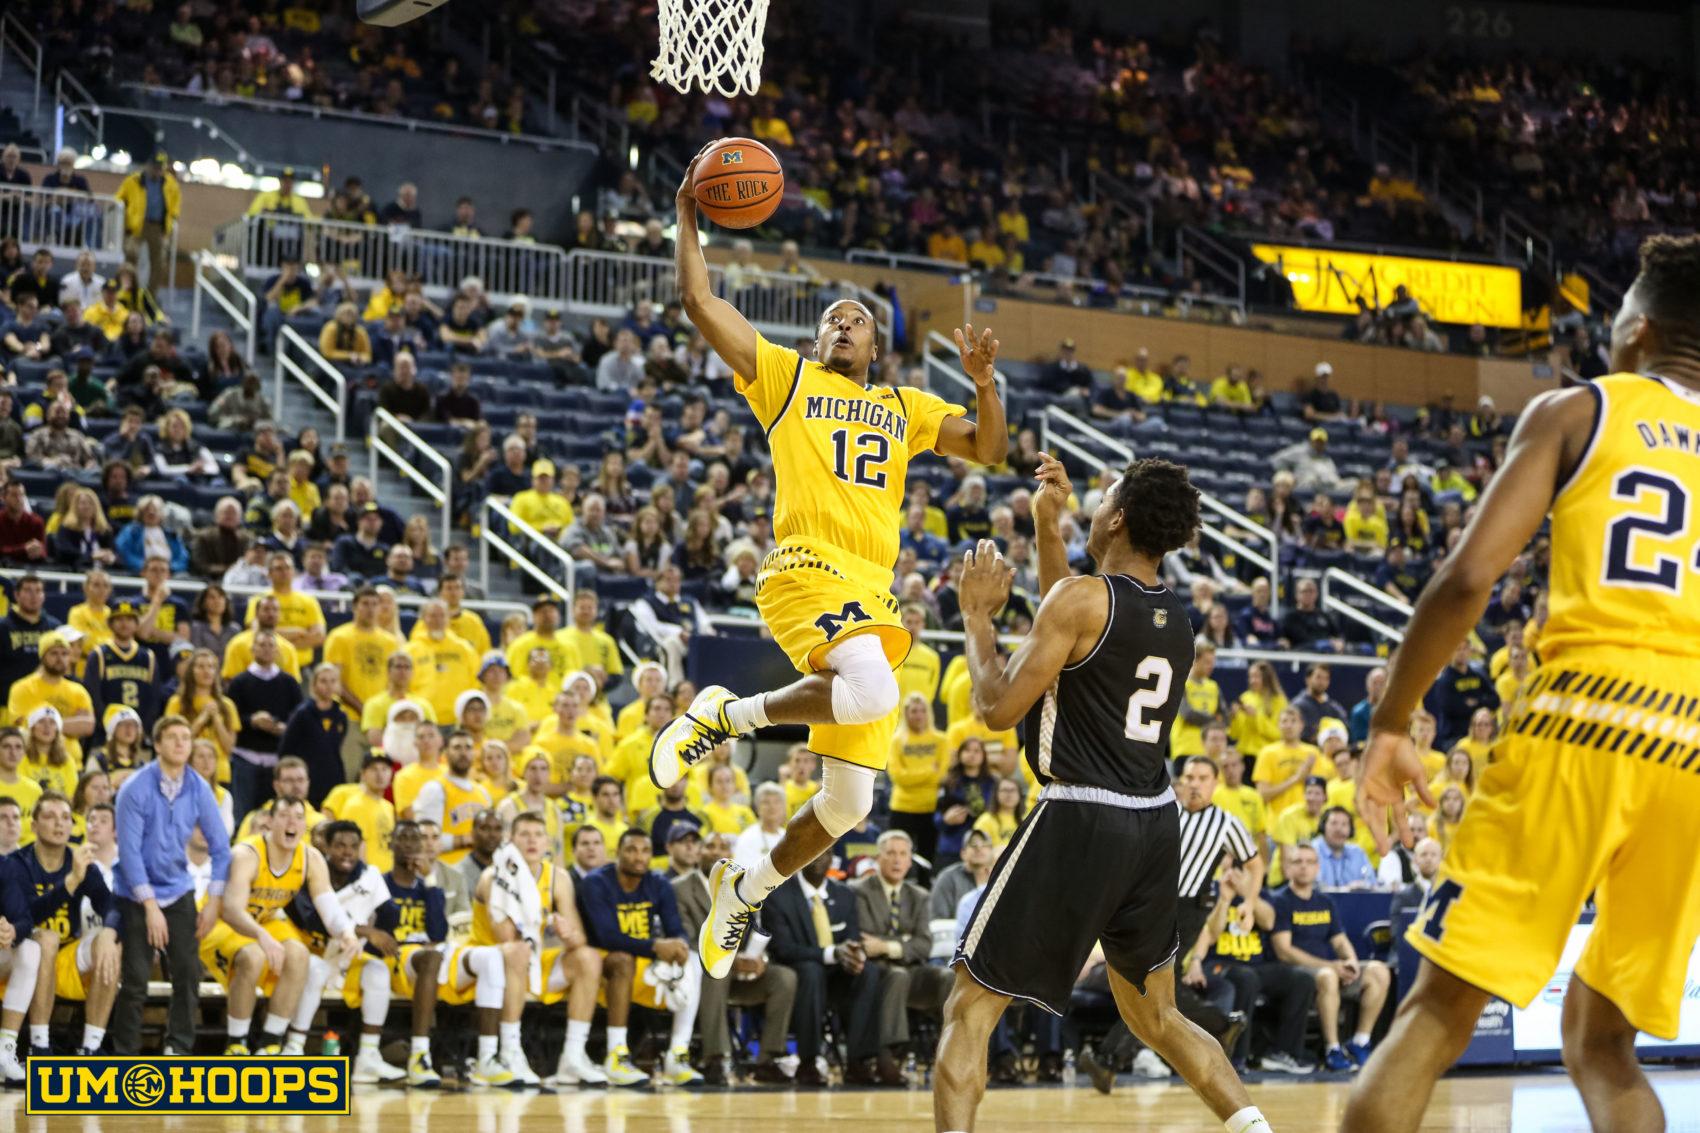 Michigan 96, Bryant 60-26